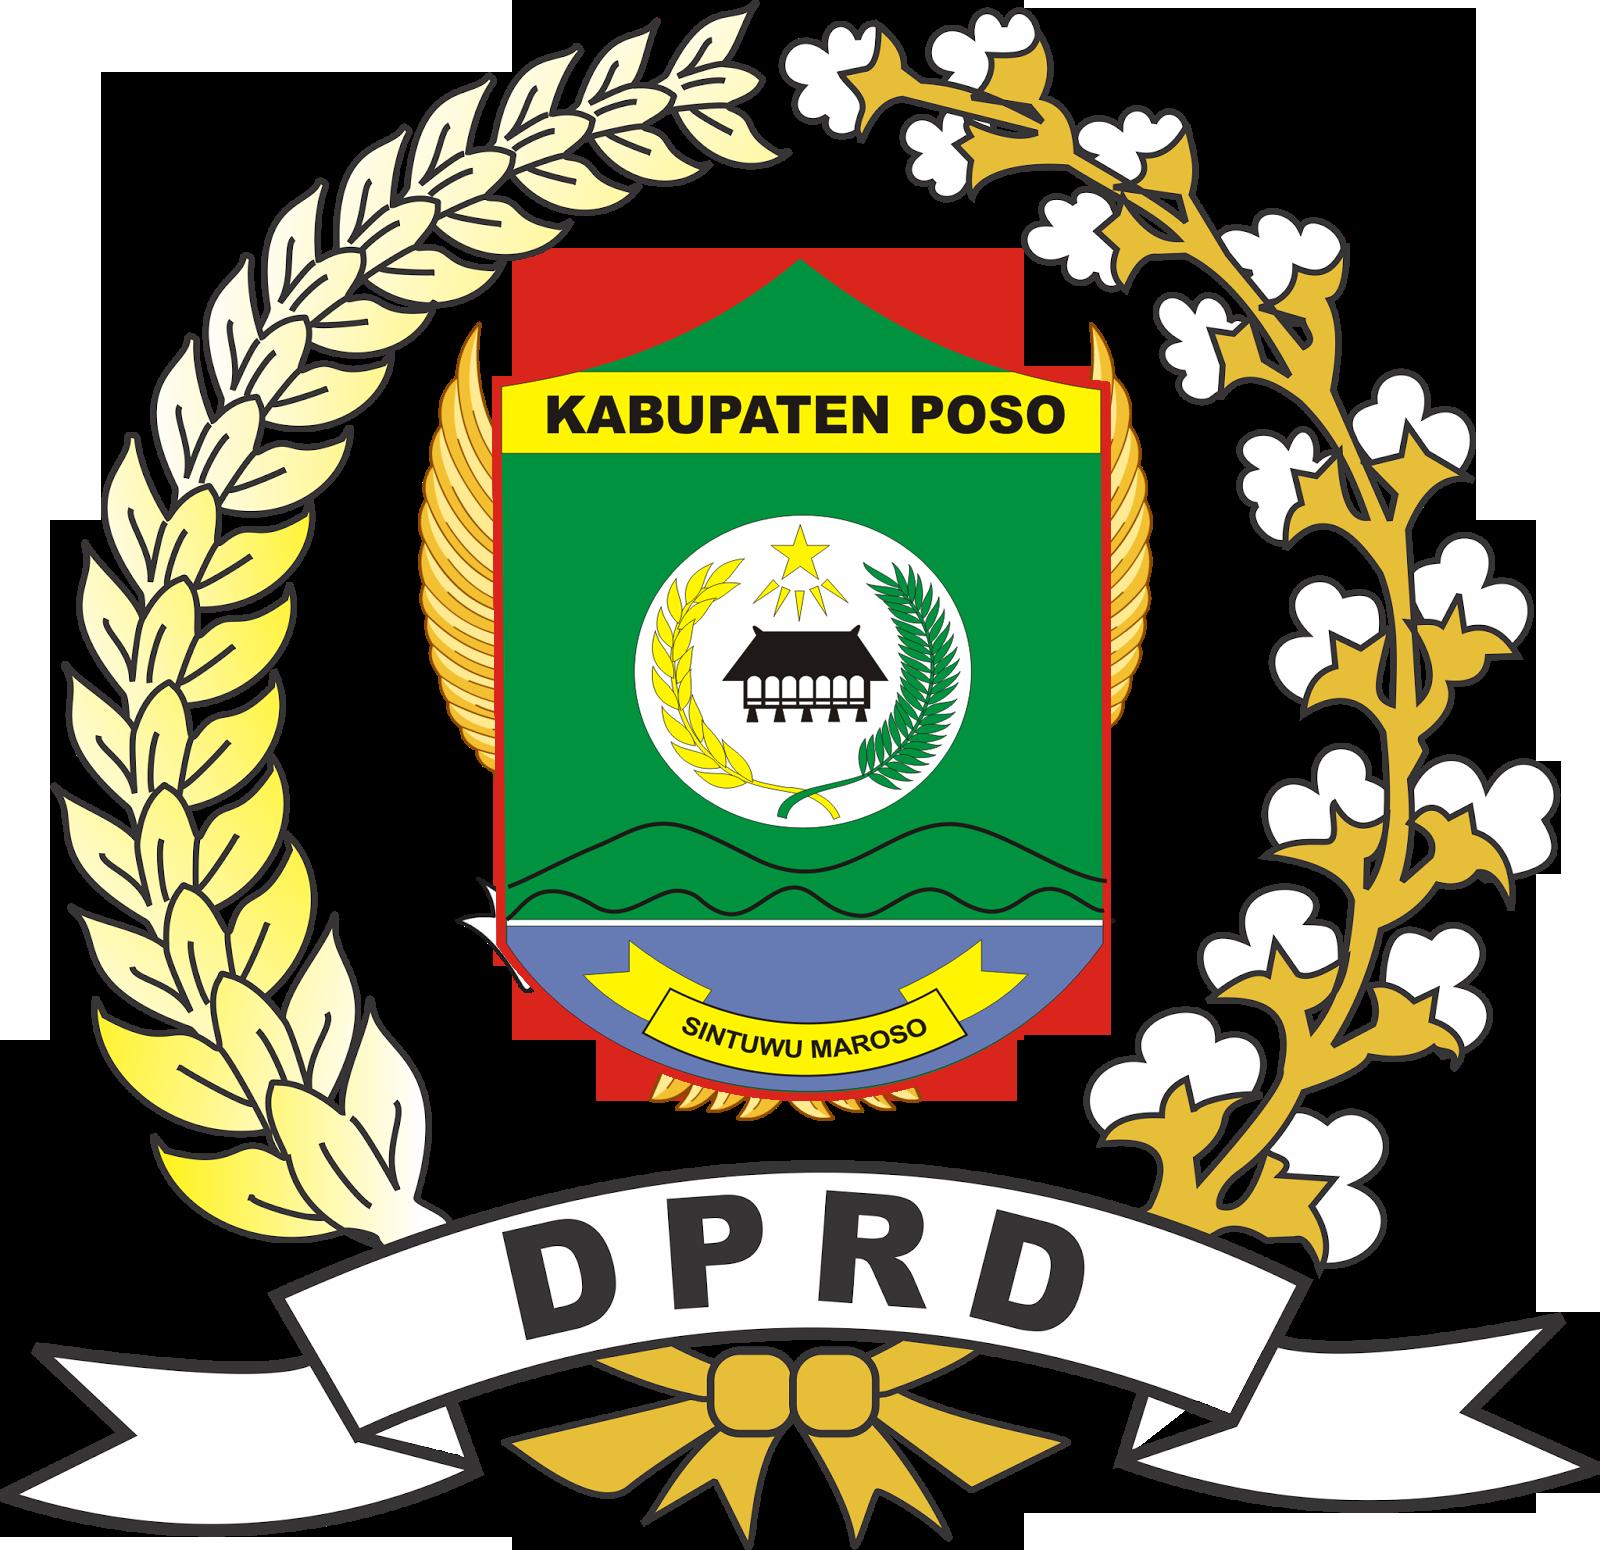 Berkas Lambang Dprd Kabupaten Poso Png Wikipedia Bahasa Indonesia Ensiklopedia Bebas